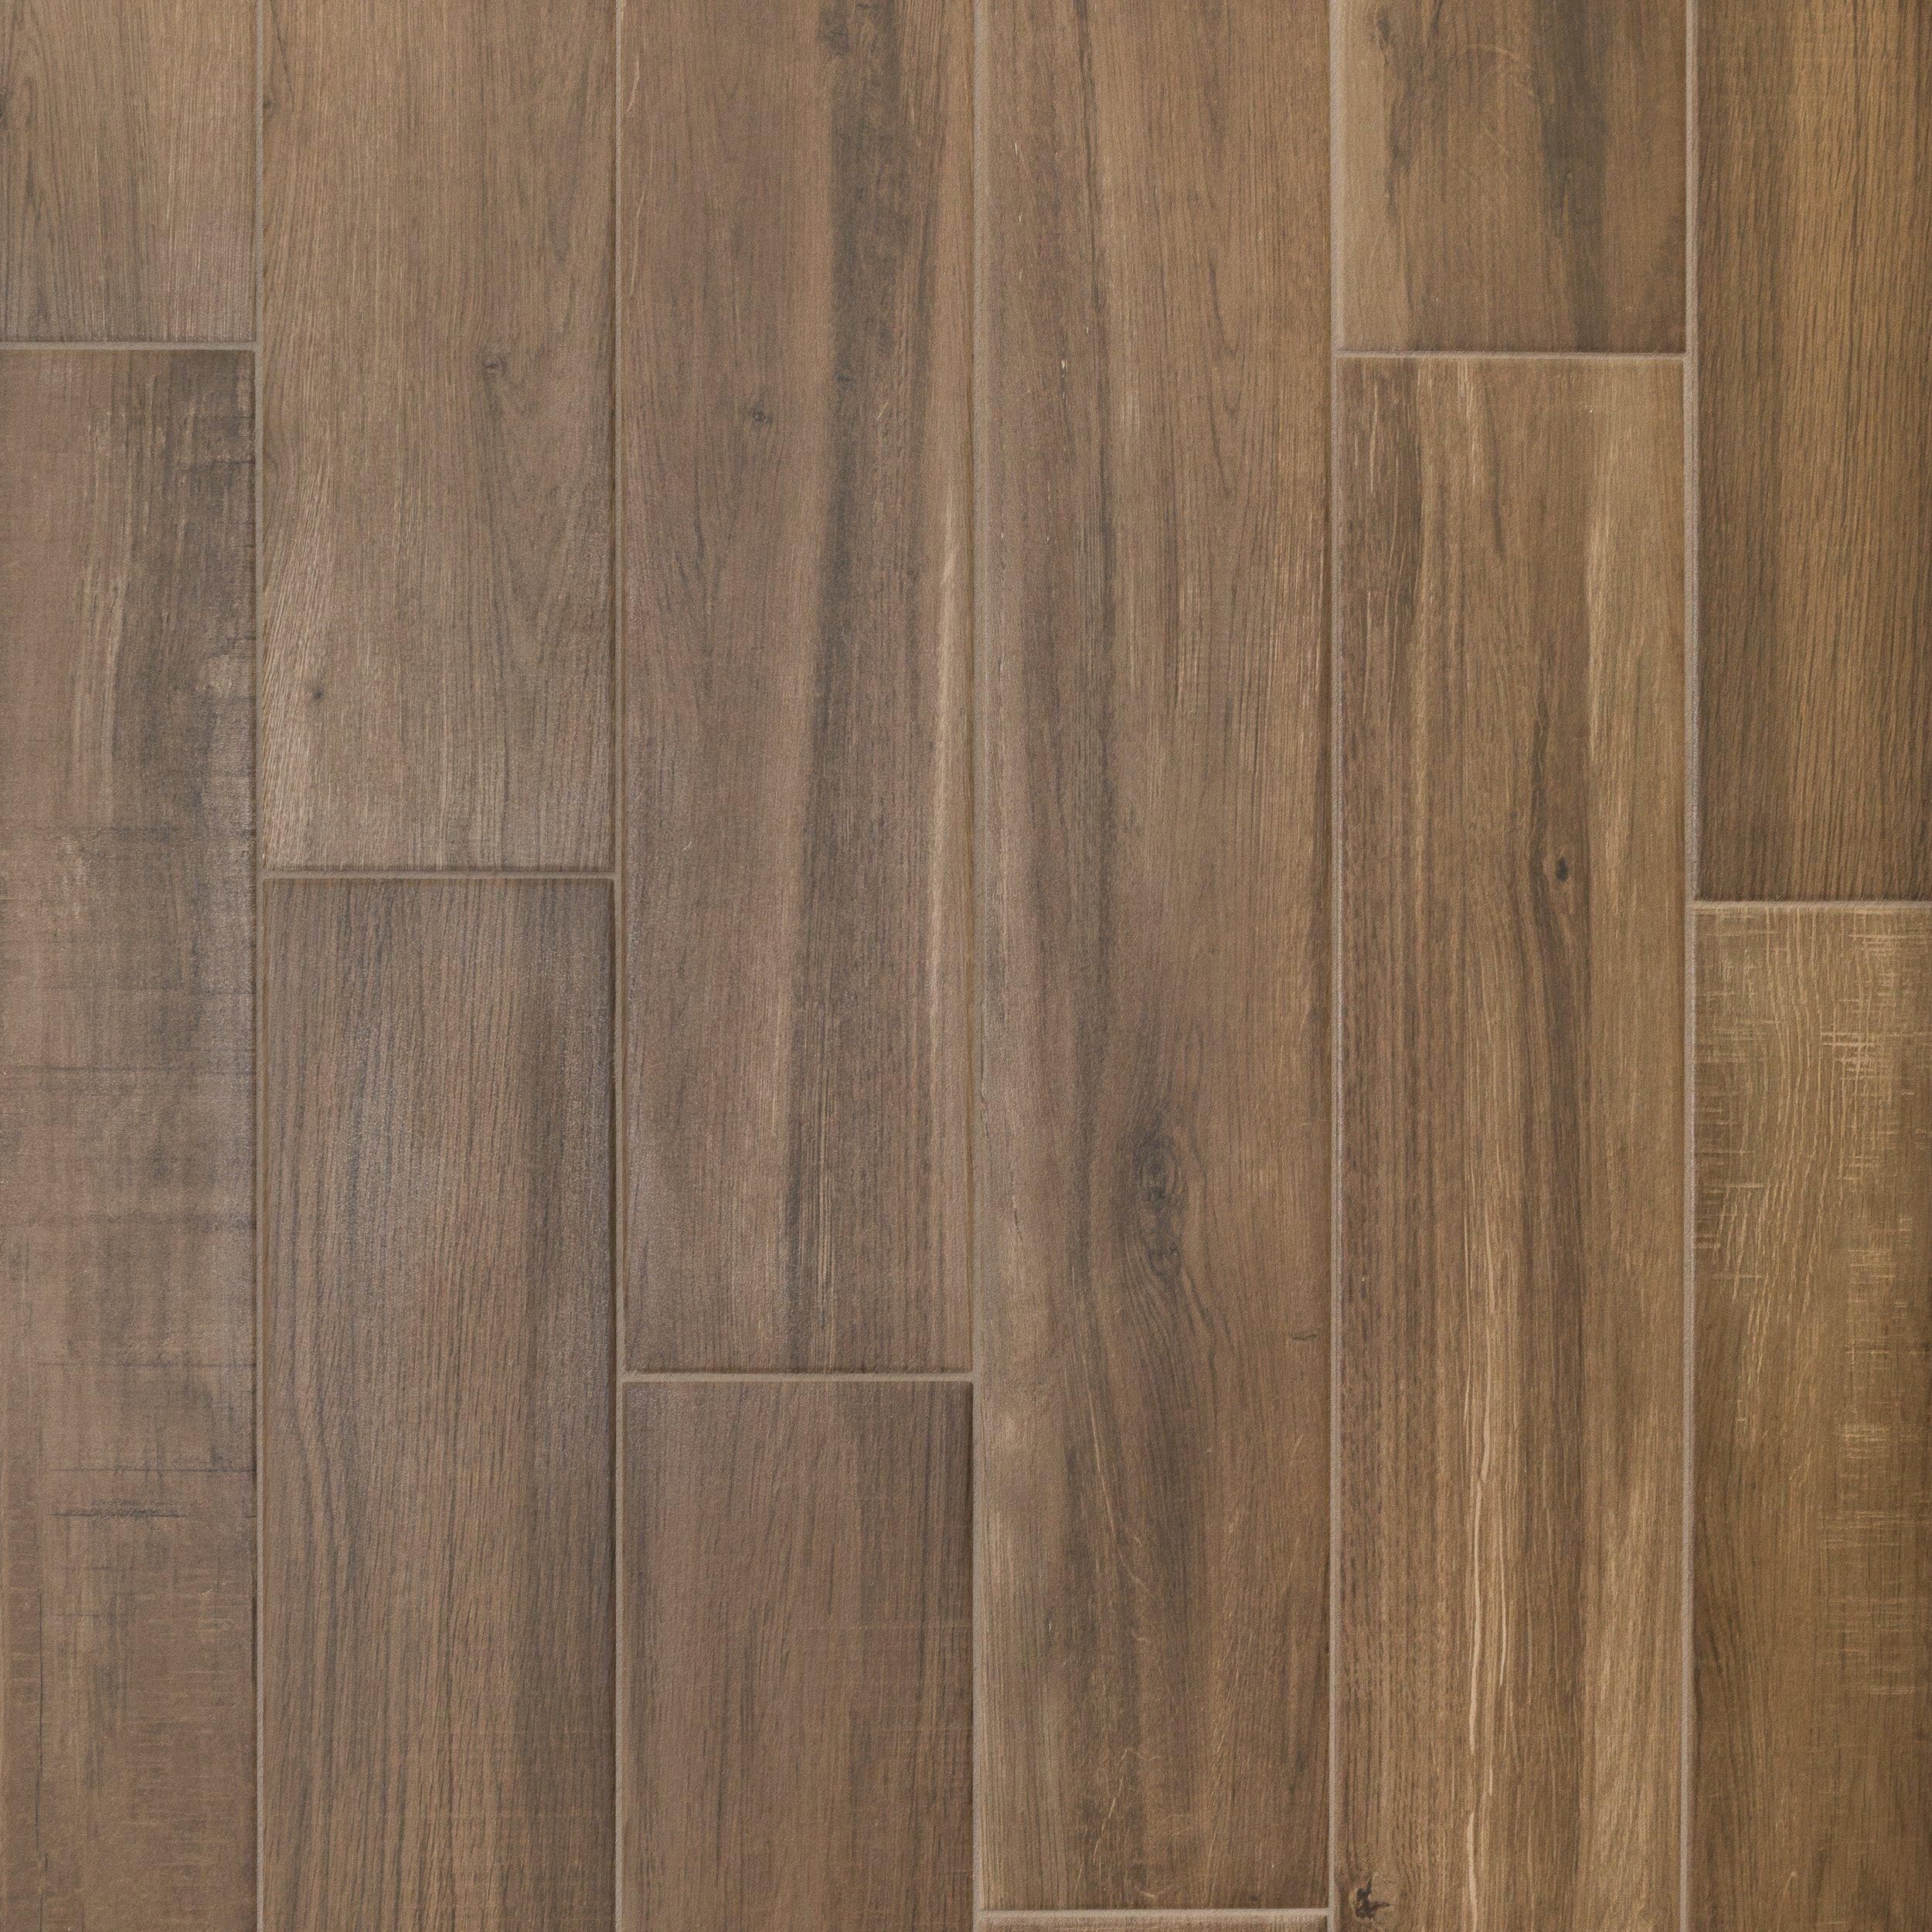 Ozark Pecan Wood Plank Porcelain Tile Products In 2019